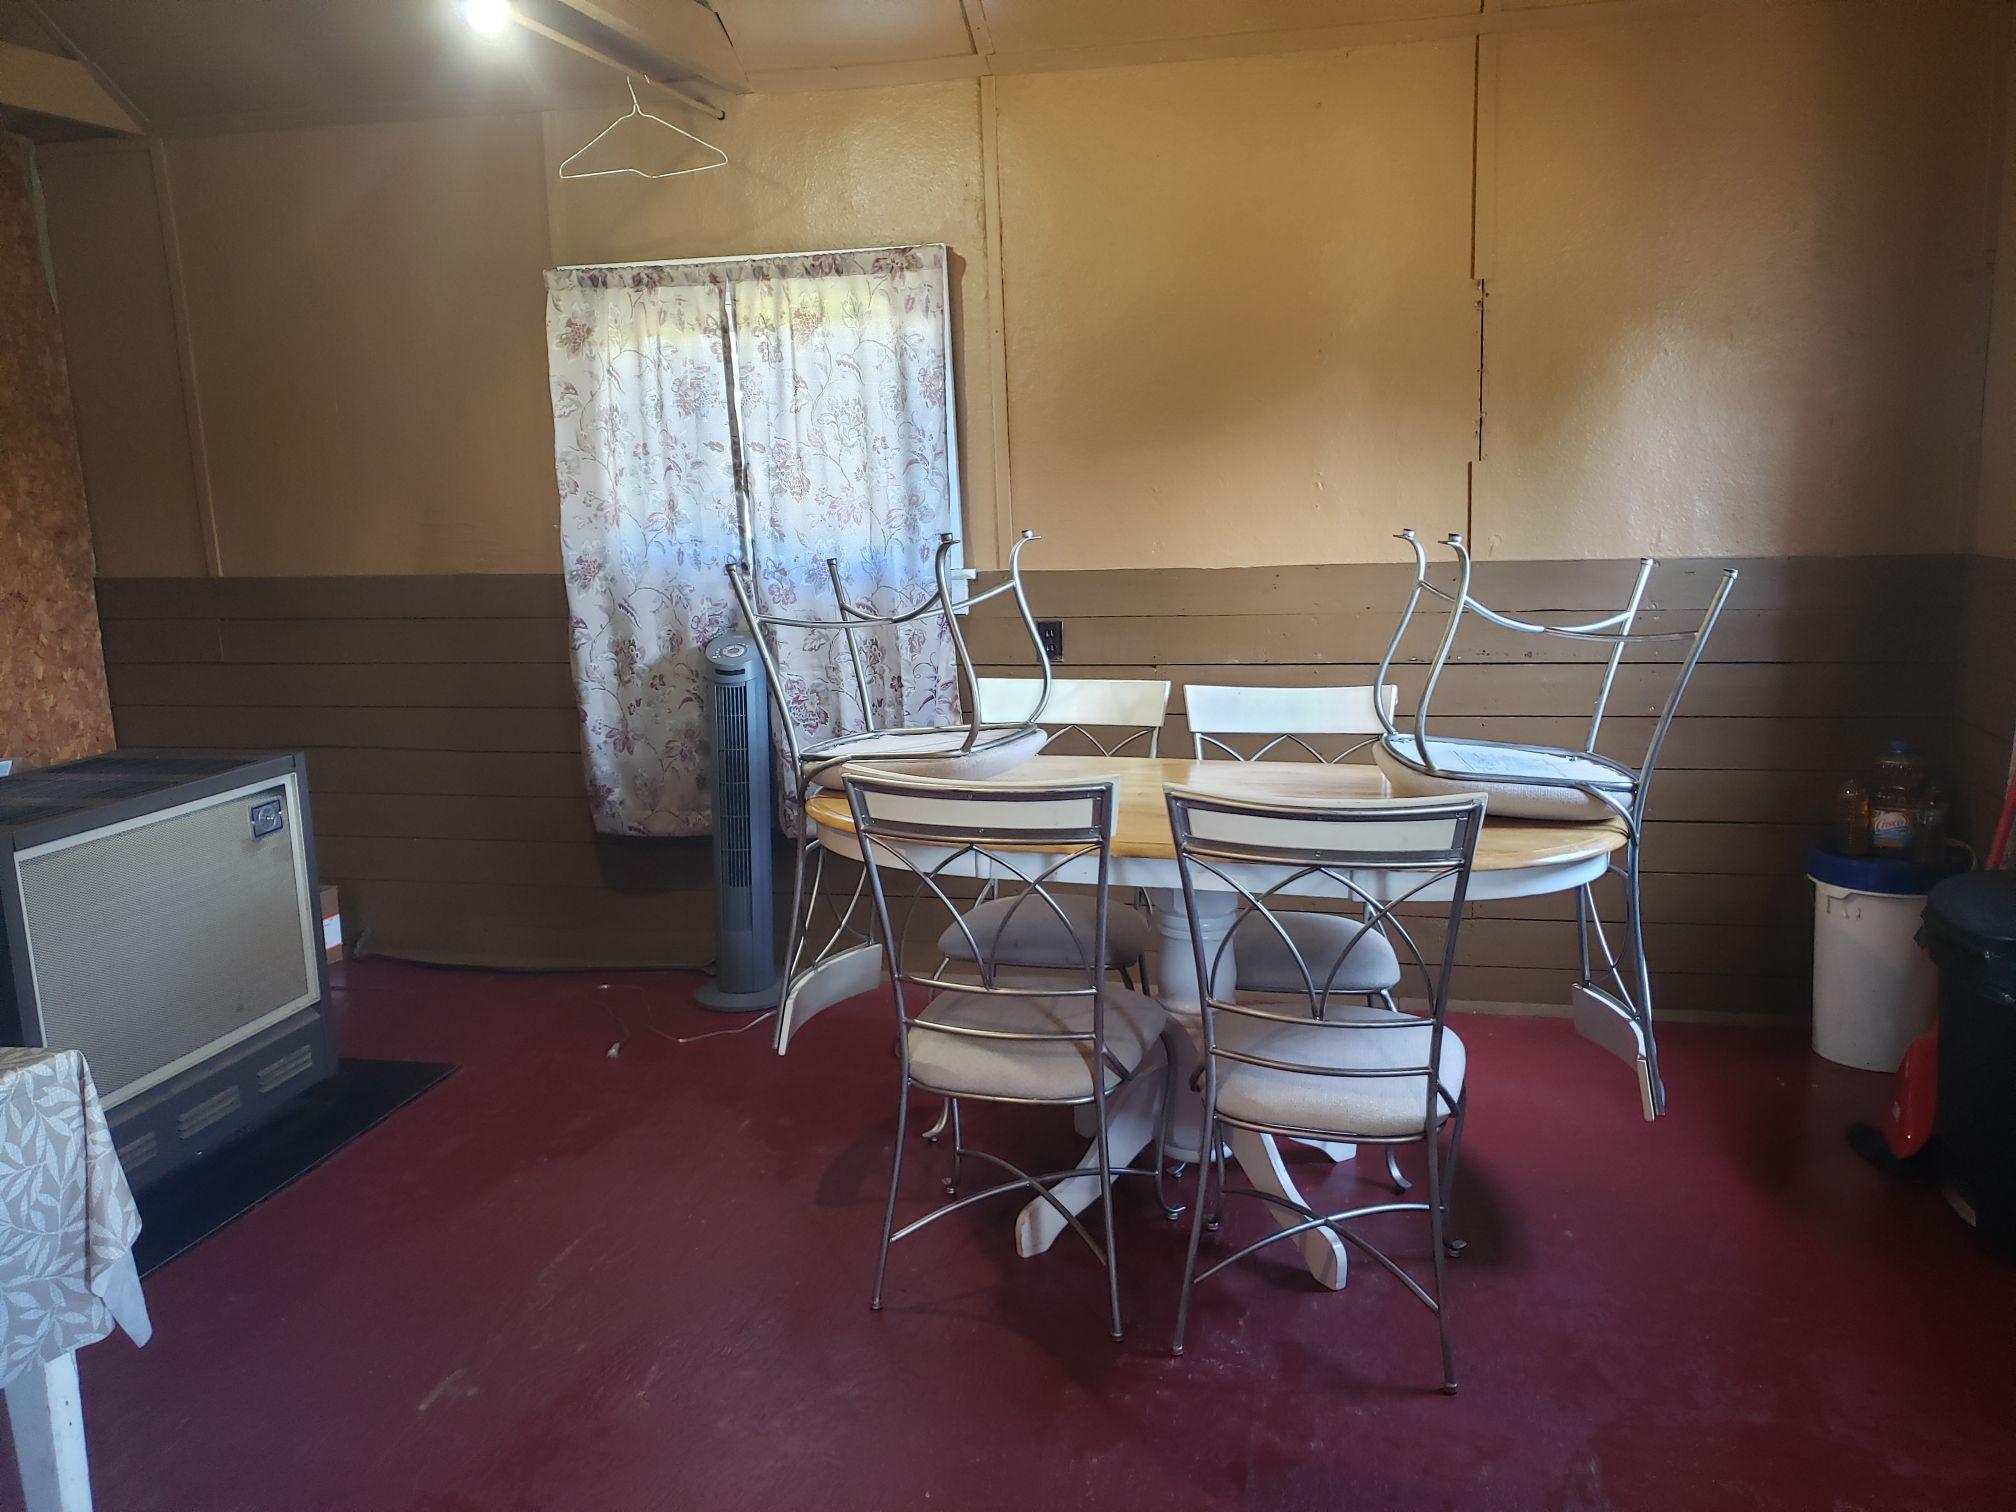 Bobcat-Diningroom2-Trappers Point Camp-Sturgeon Lake-Savant Lake-Ontario